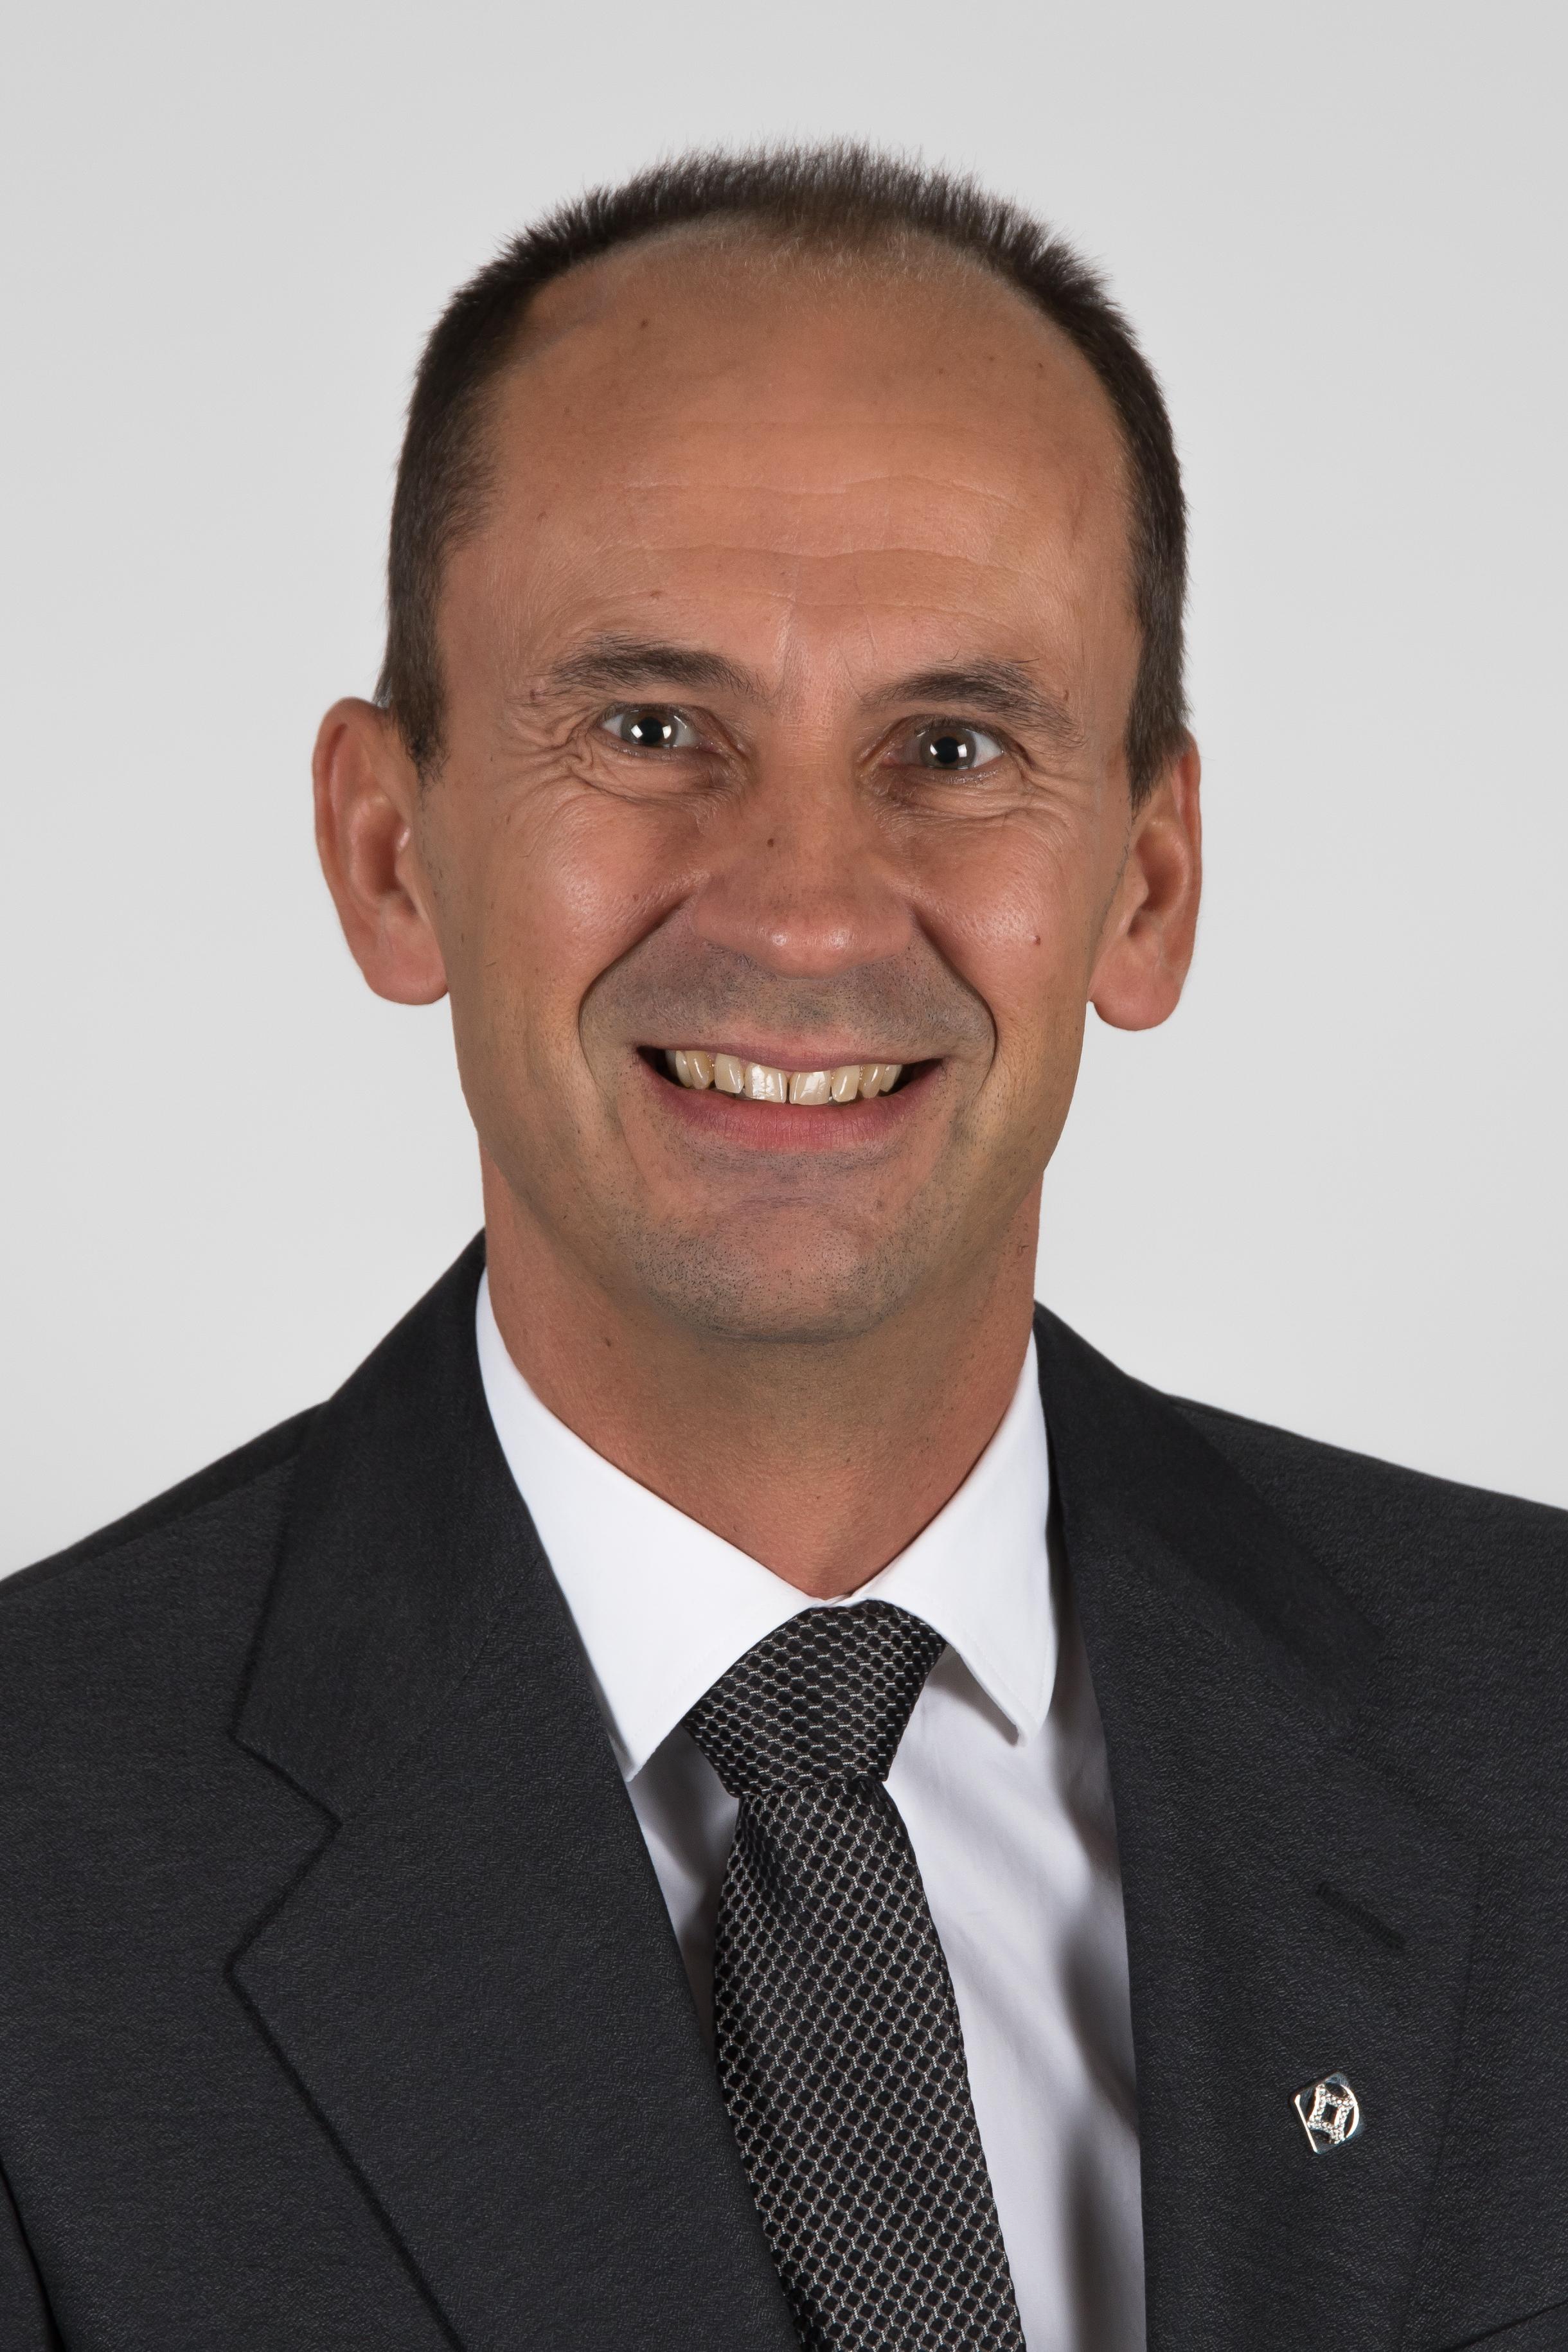 Mikko Latvala